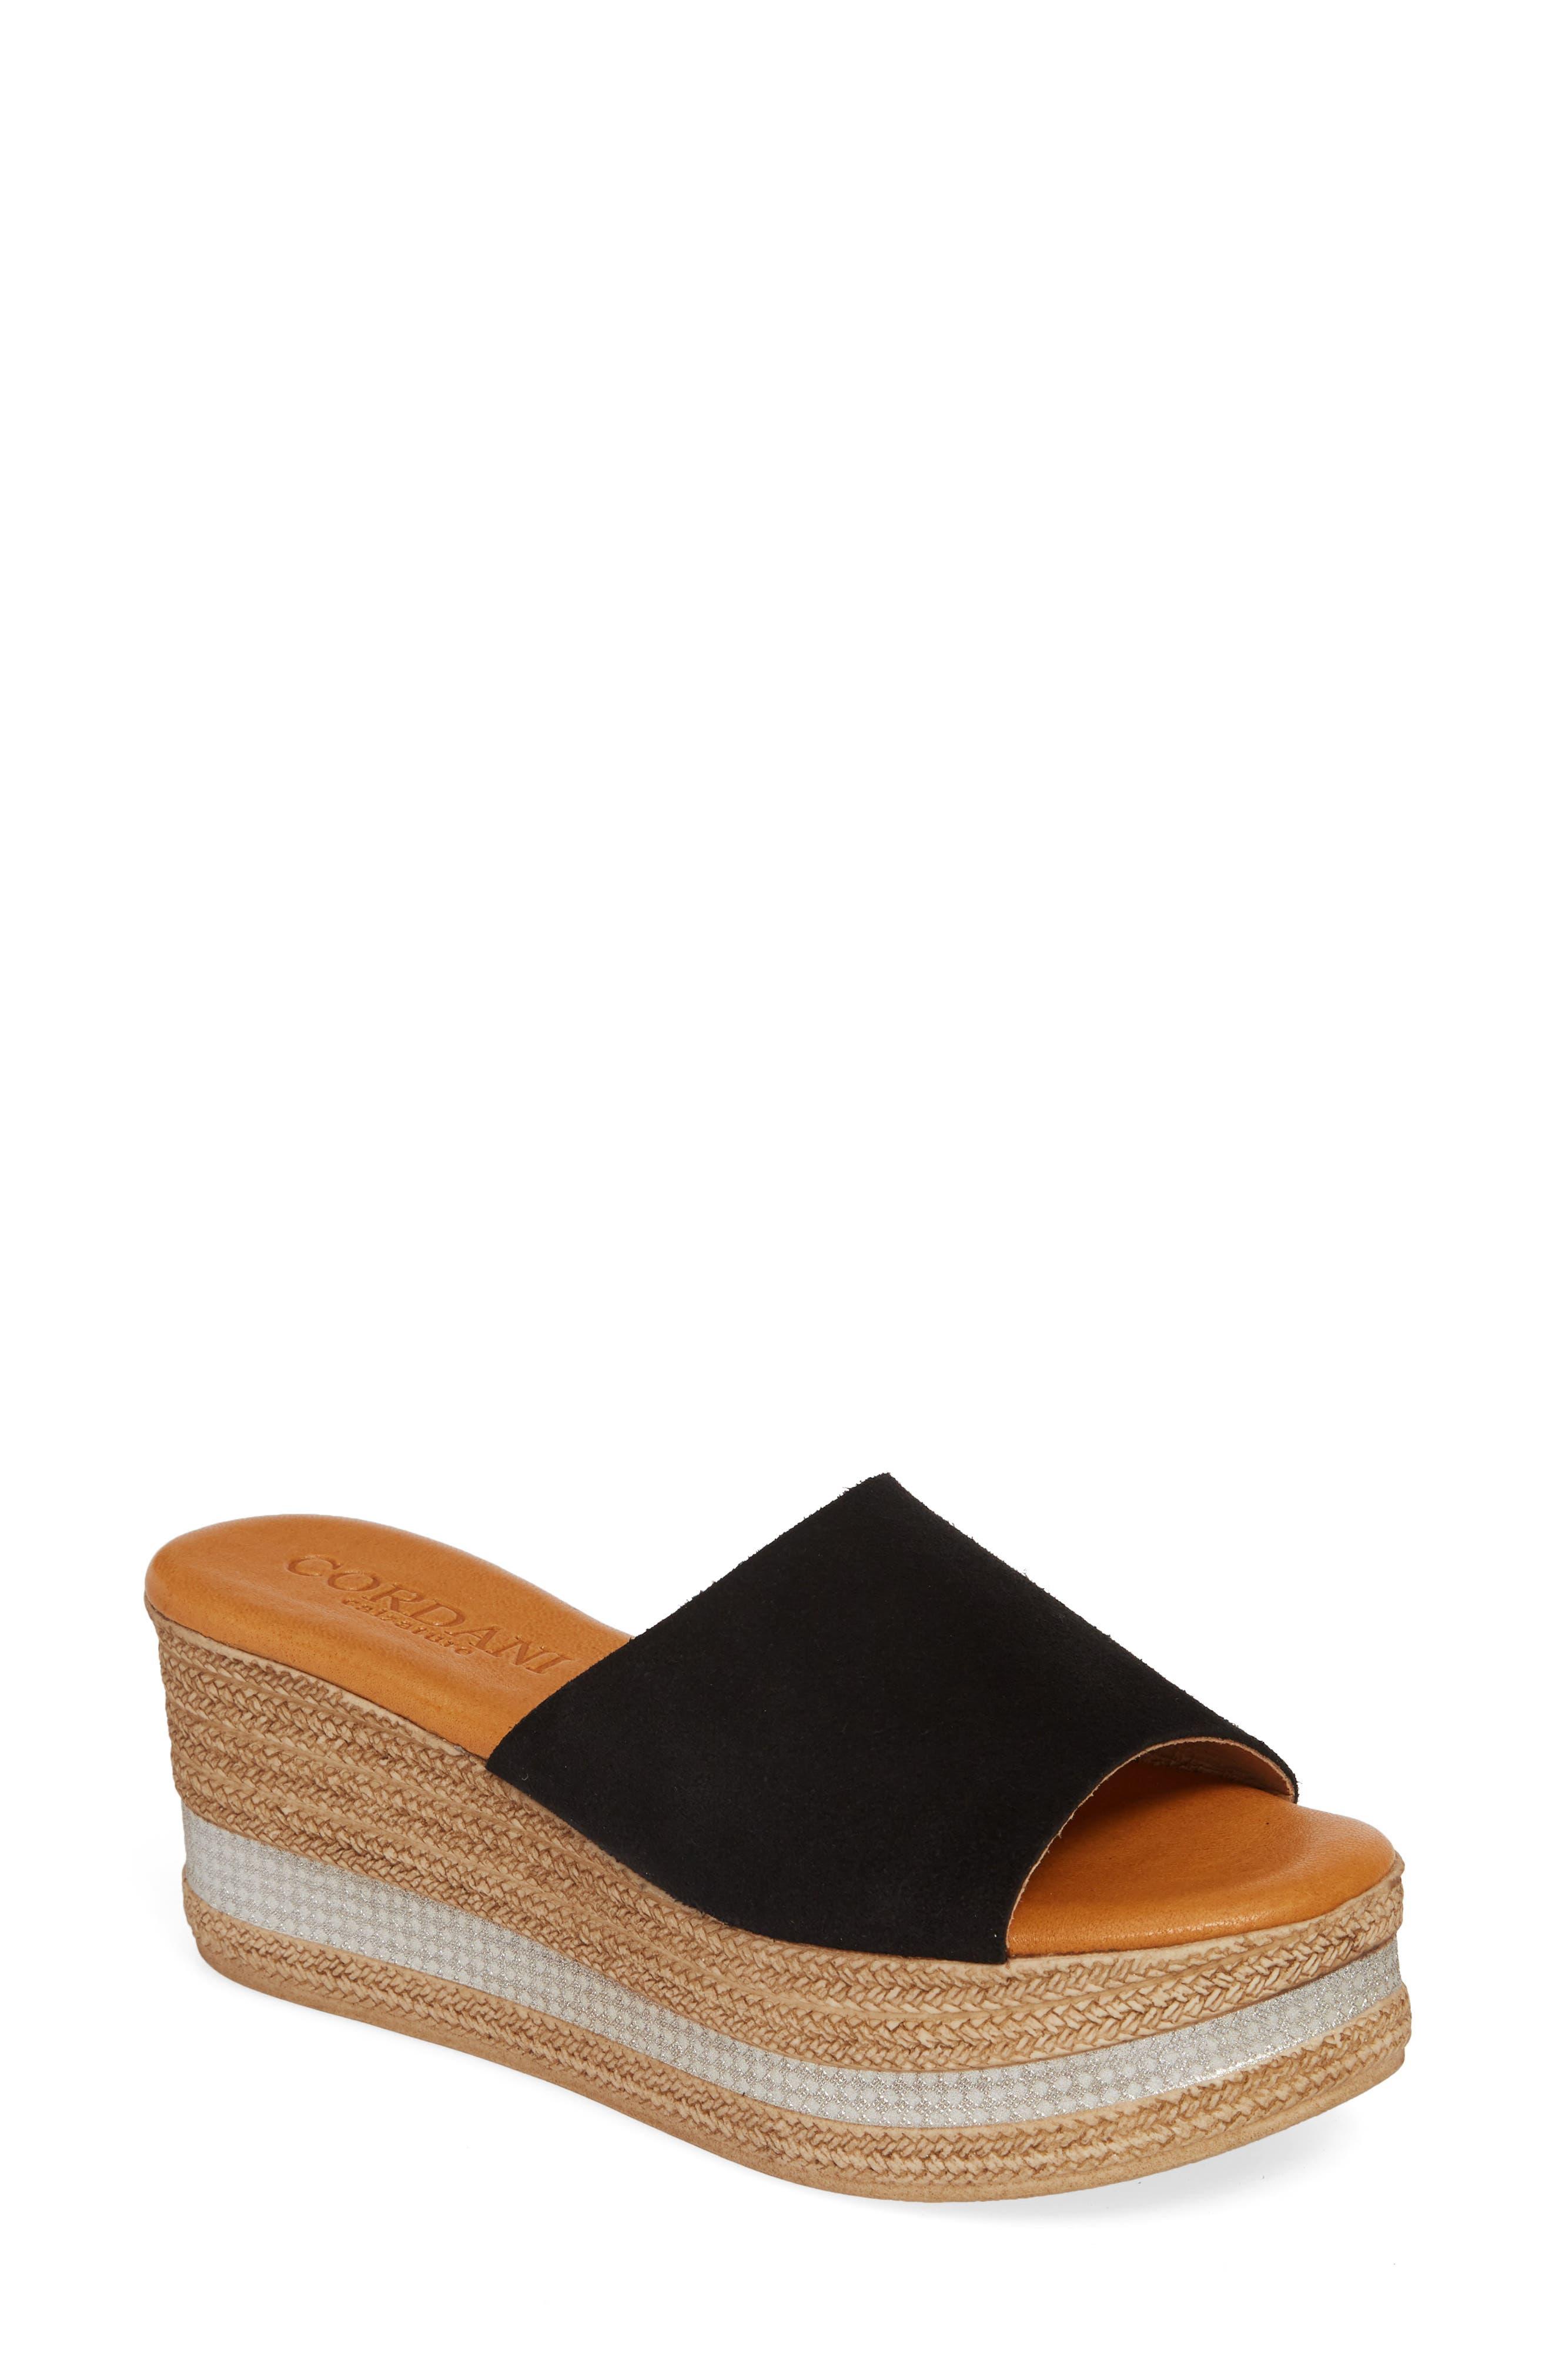 Cordani Barbara Wedge Slide Sandal, Black